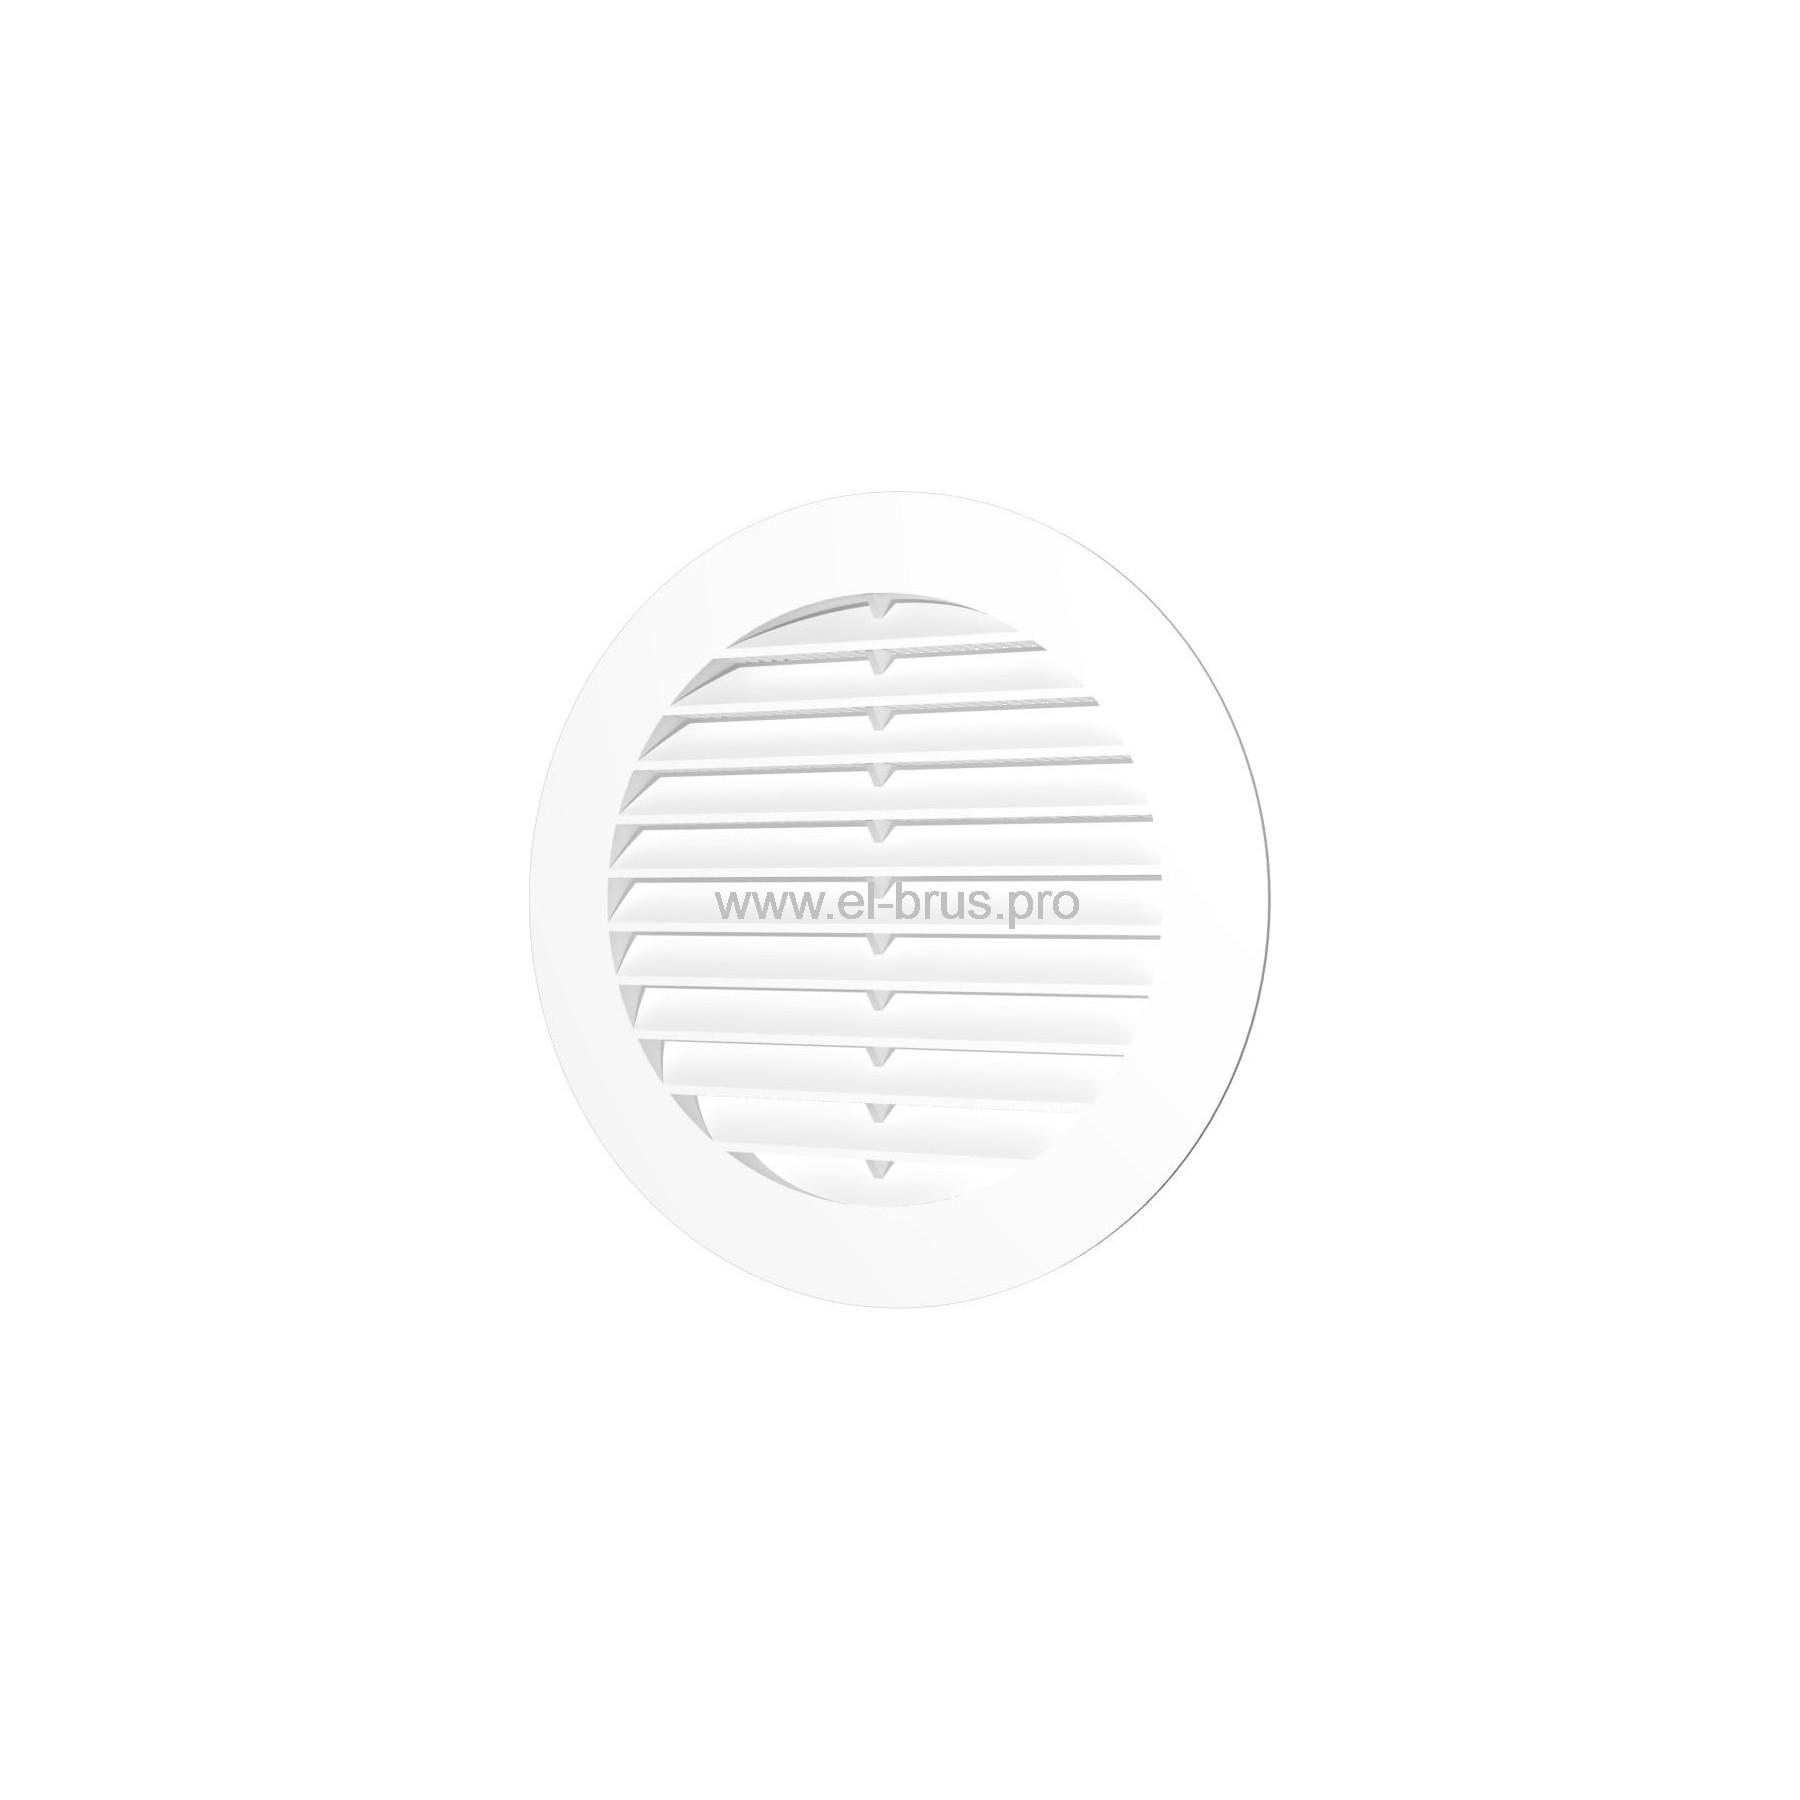 Решетка вент. круглая с сеткой Ø130мм и фланцем Ø100мм ERA 10РКС